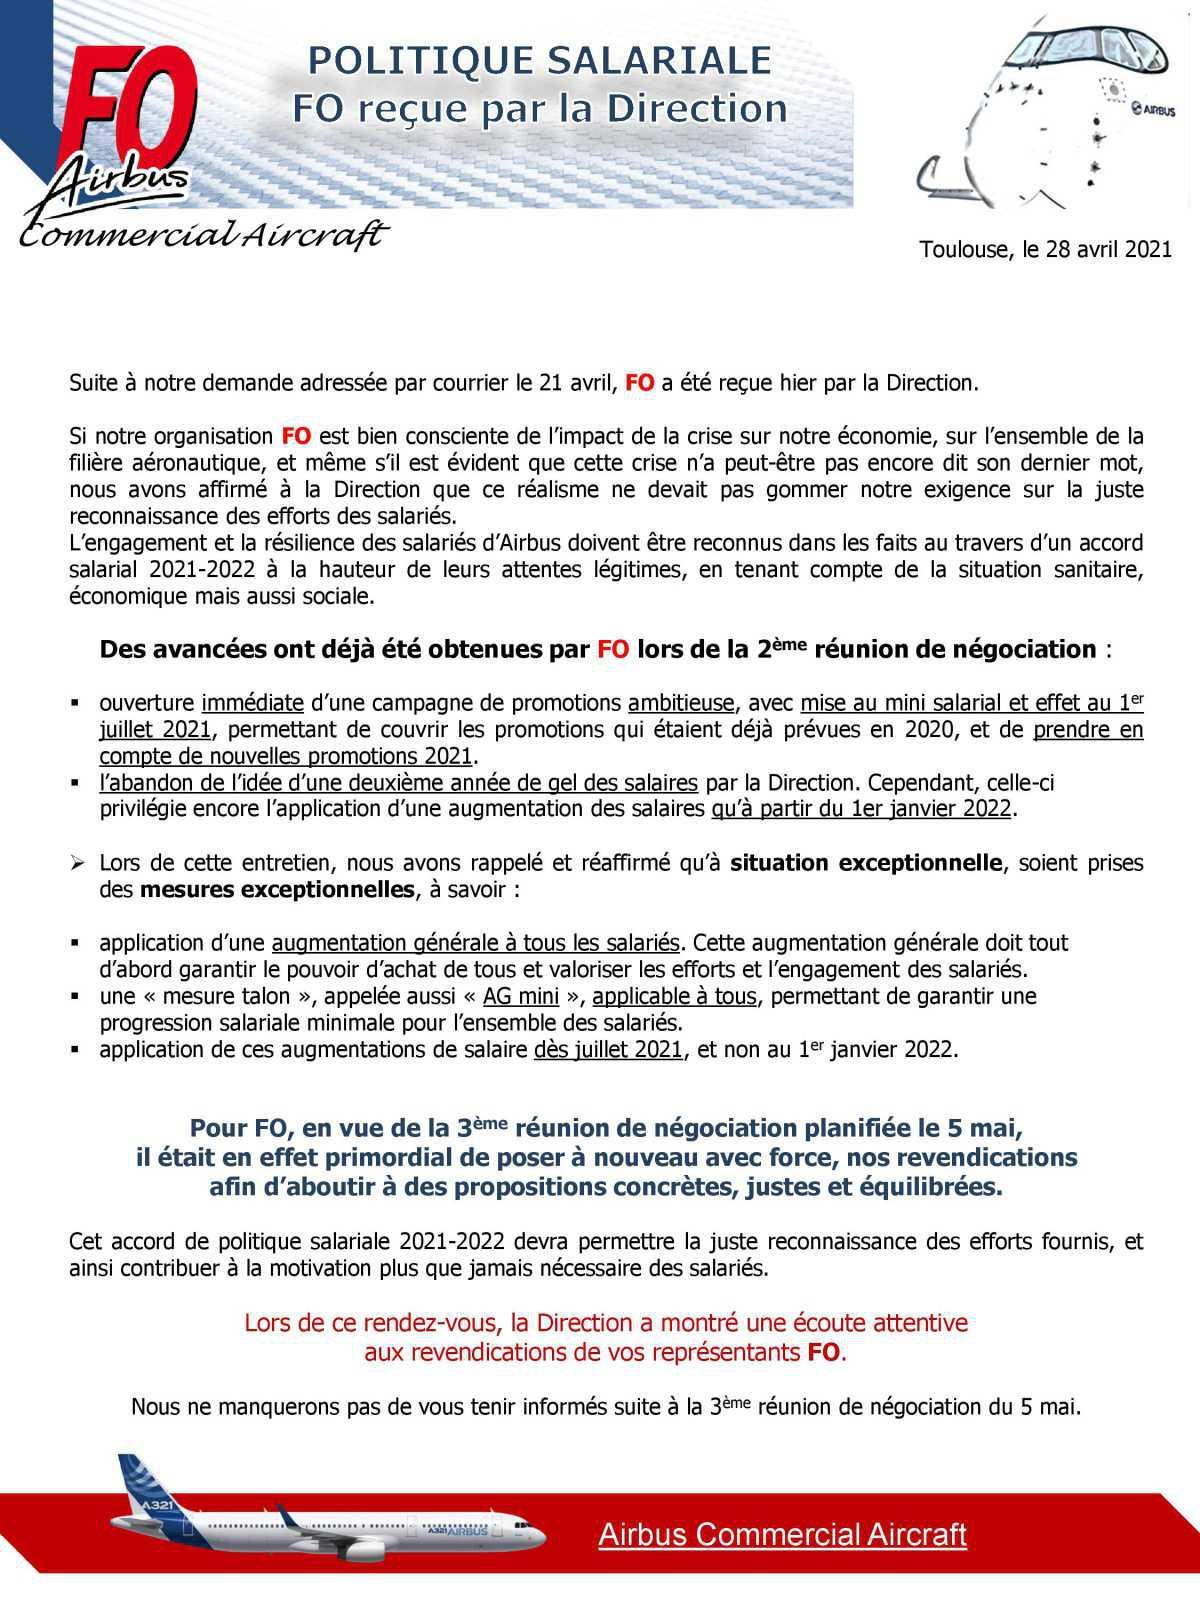 Rencontre FO/Direction politique salariale